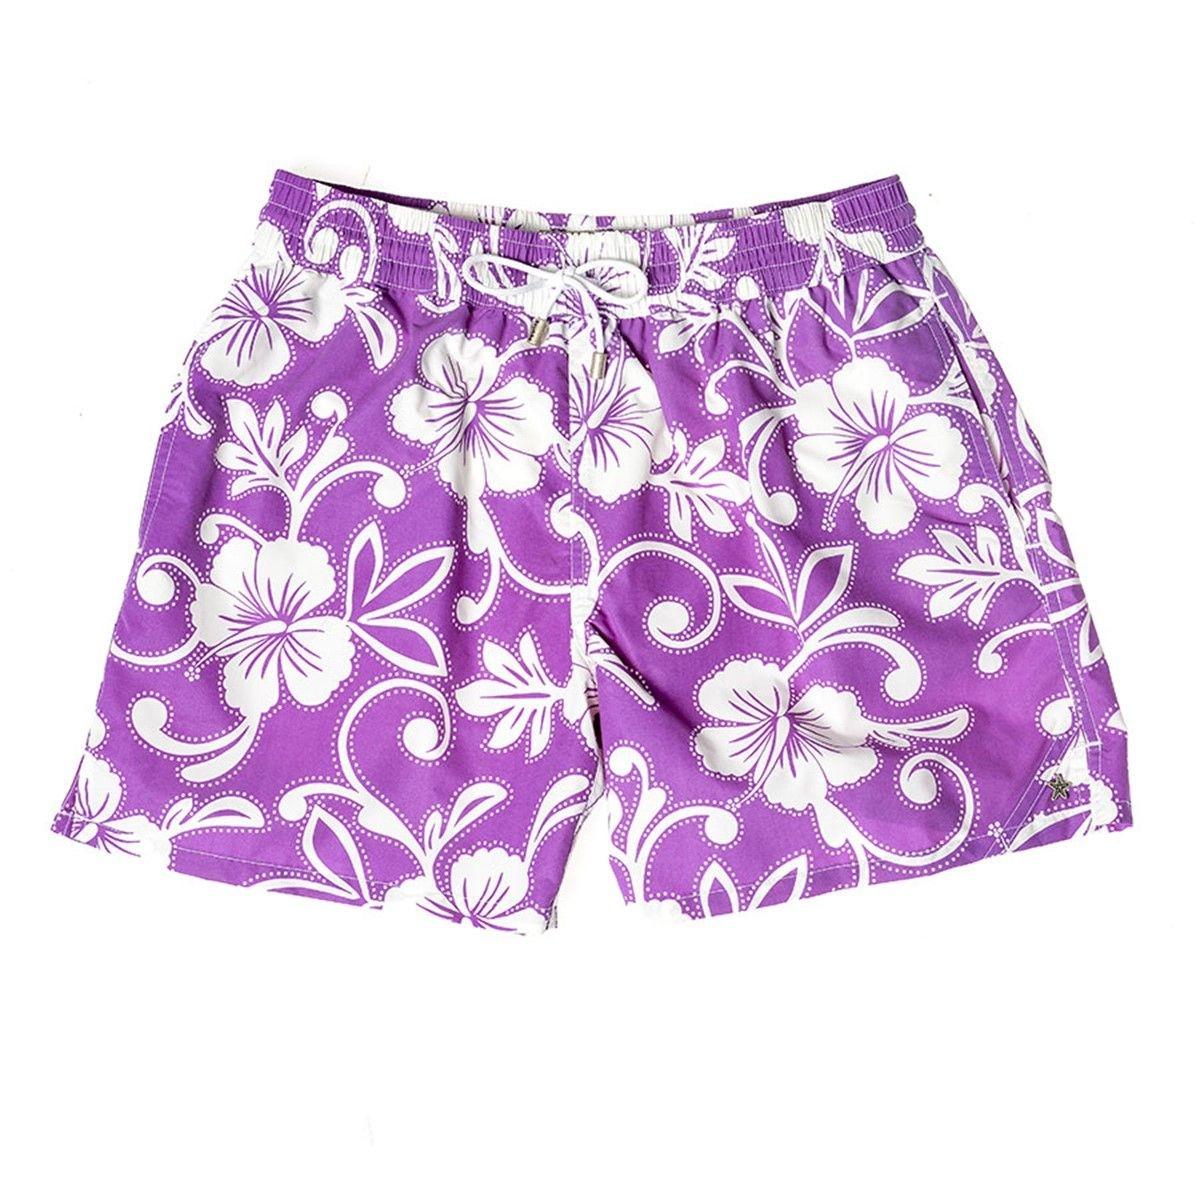 Maillot de bain fleuri violet FUTUNA